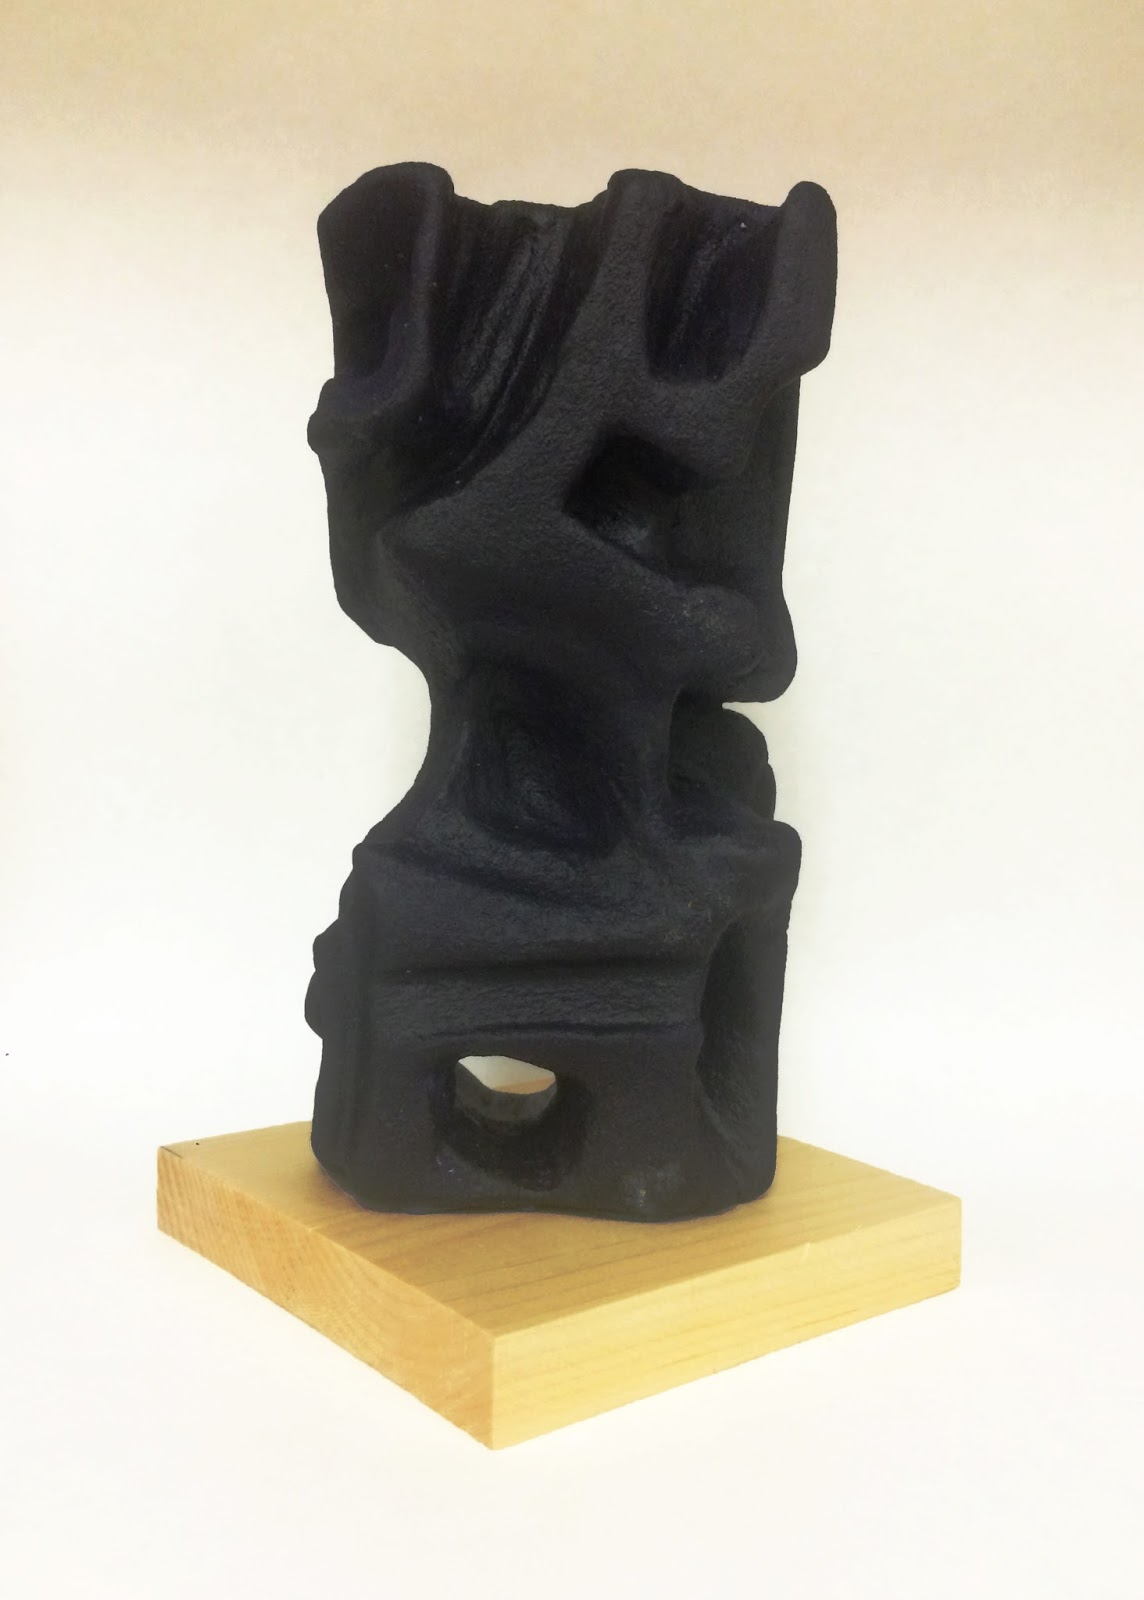 Art paper scissors glue foam sculptures